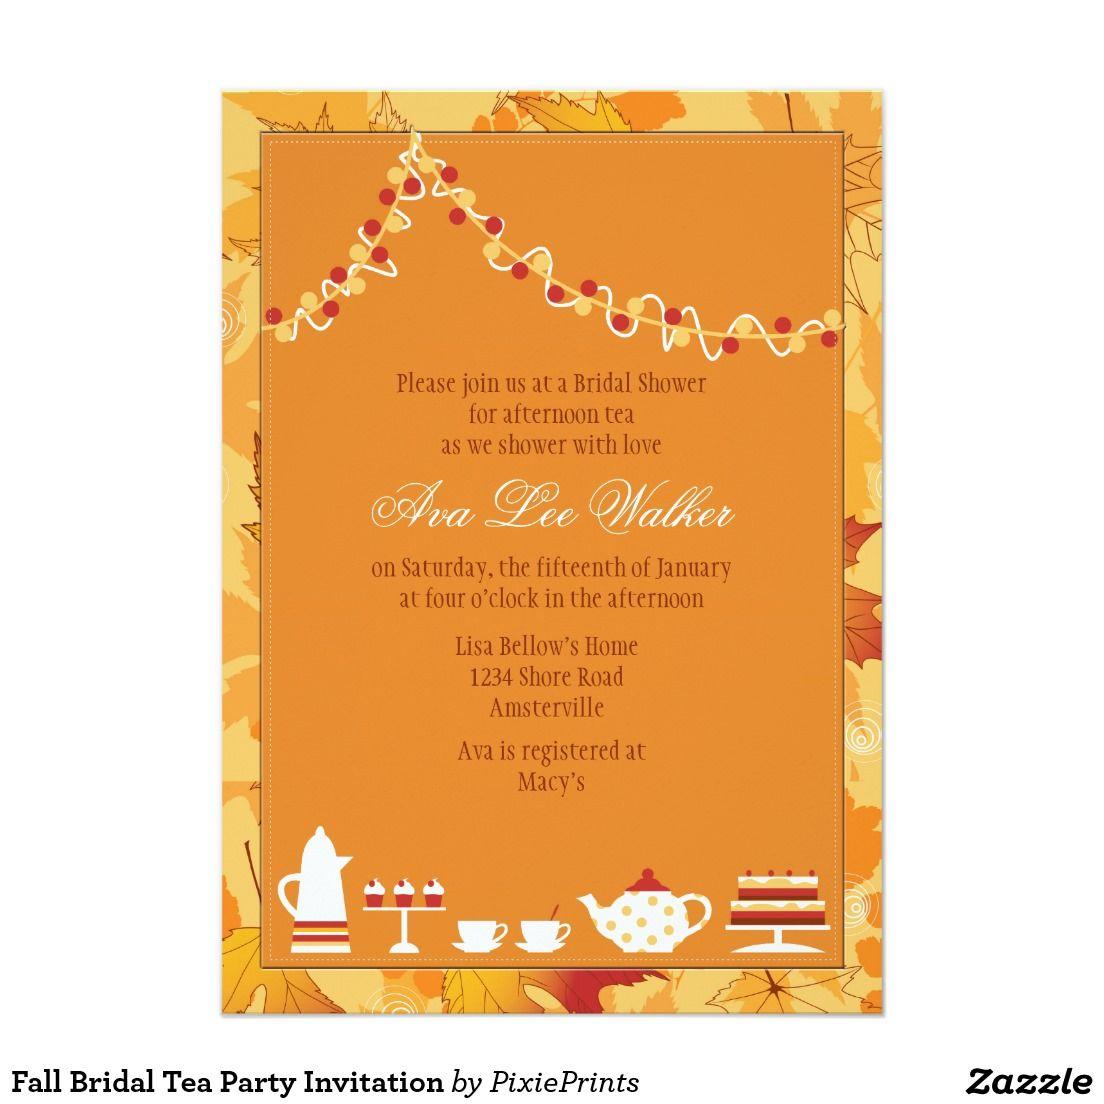 Fall Bridal Tea Party Invitation | Tea party invitations, Party ...